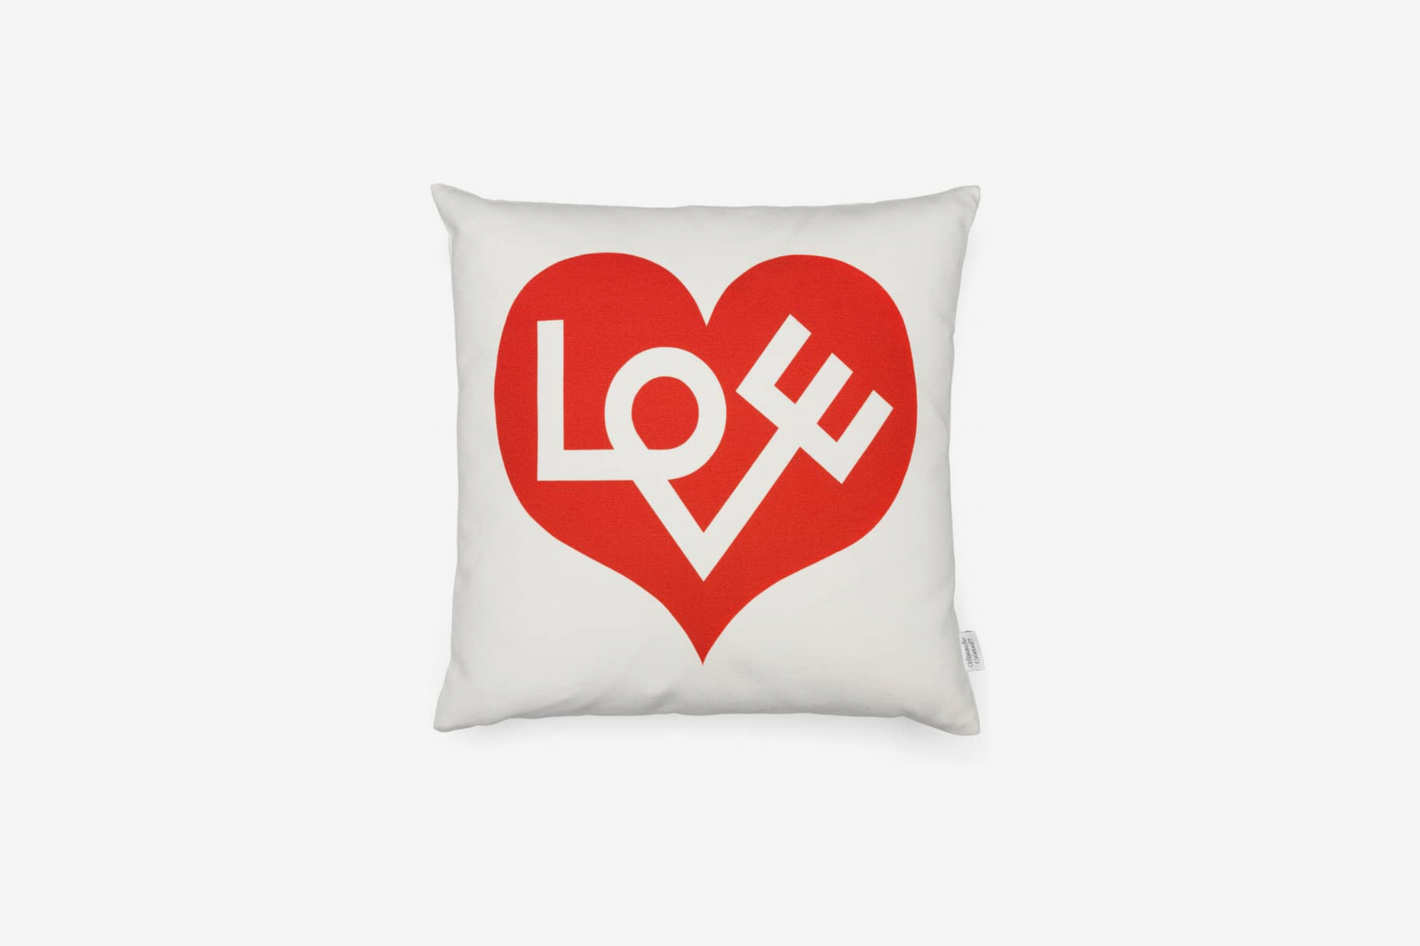 Vitra Love Graphic Print Pillow